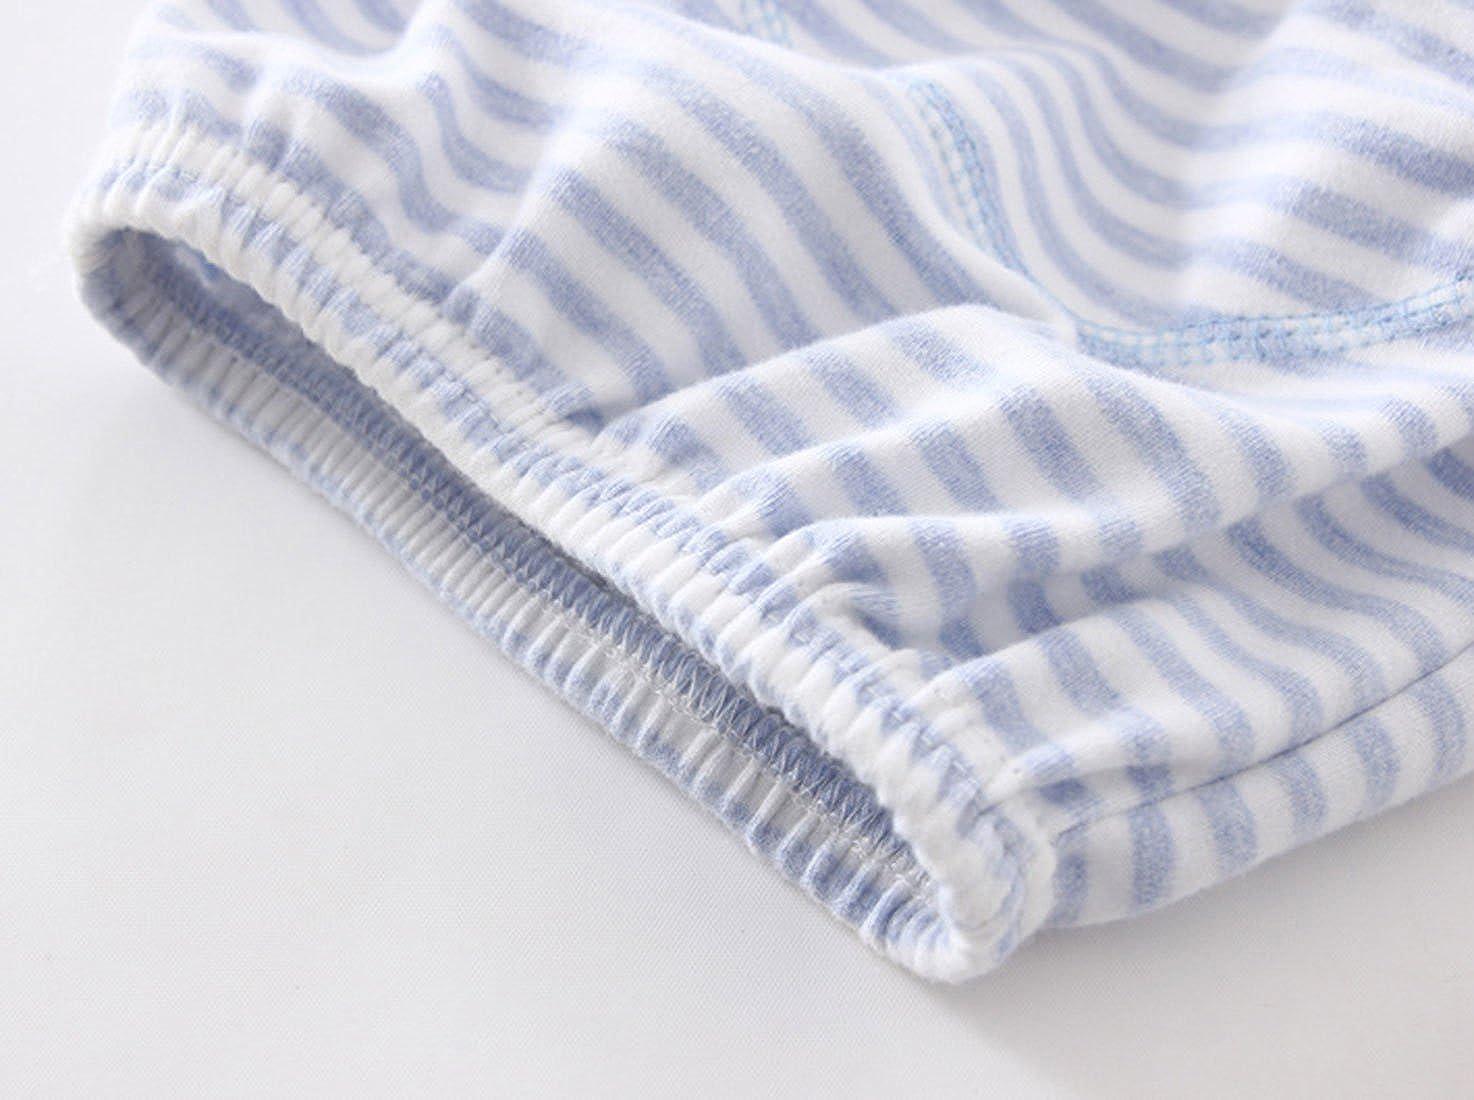 HANIBEIWA Baby Boys Training Pants Waterproof Potty Training Underwear Cotton Soft Pants 3 Pcs